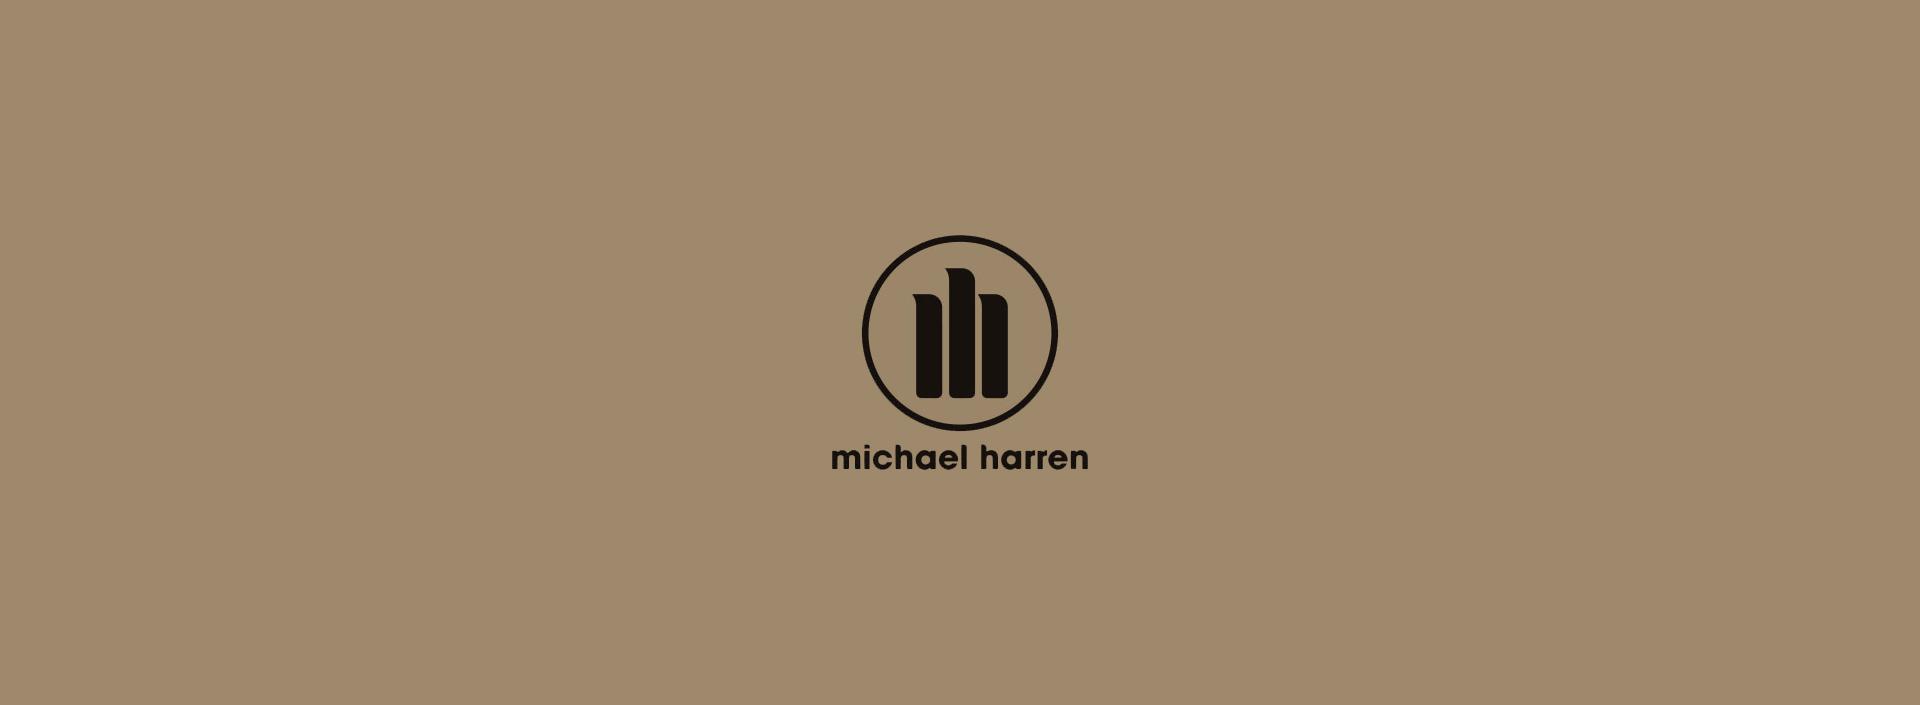 """Michael Harren"" logos in a light and dark backgrounds."